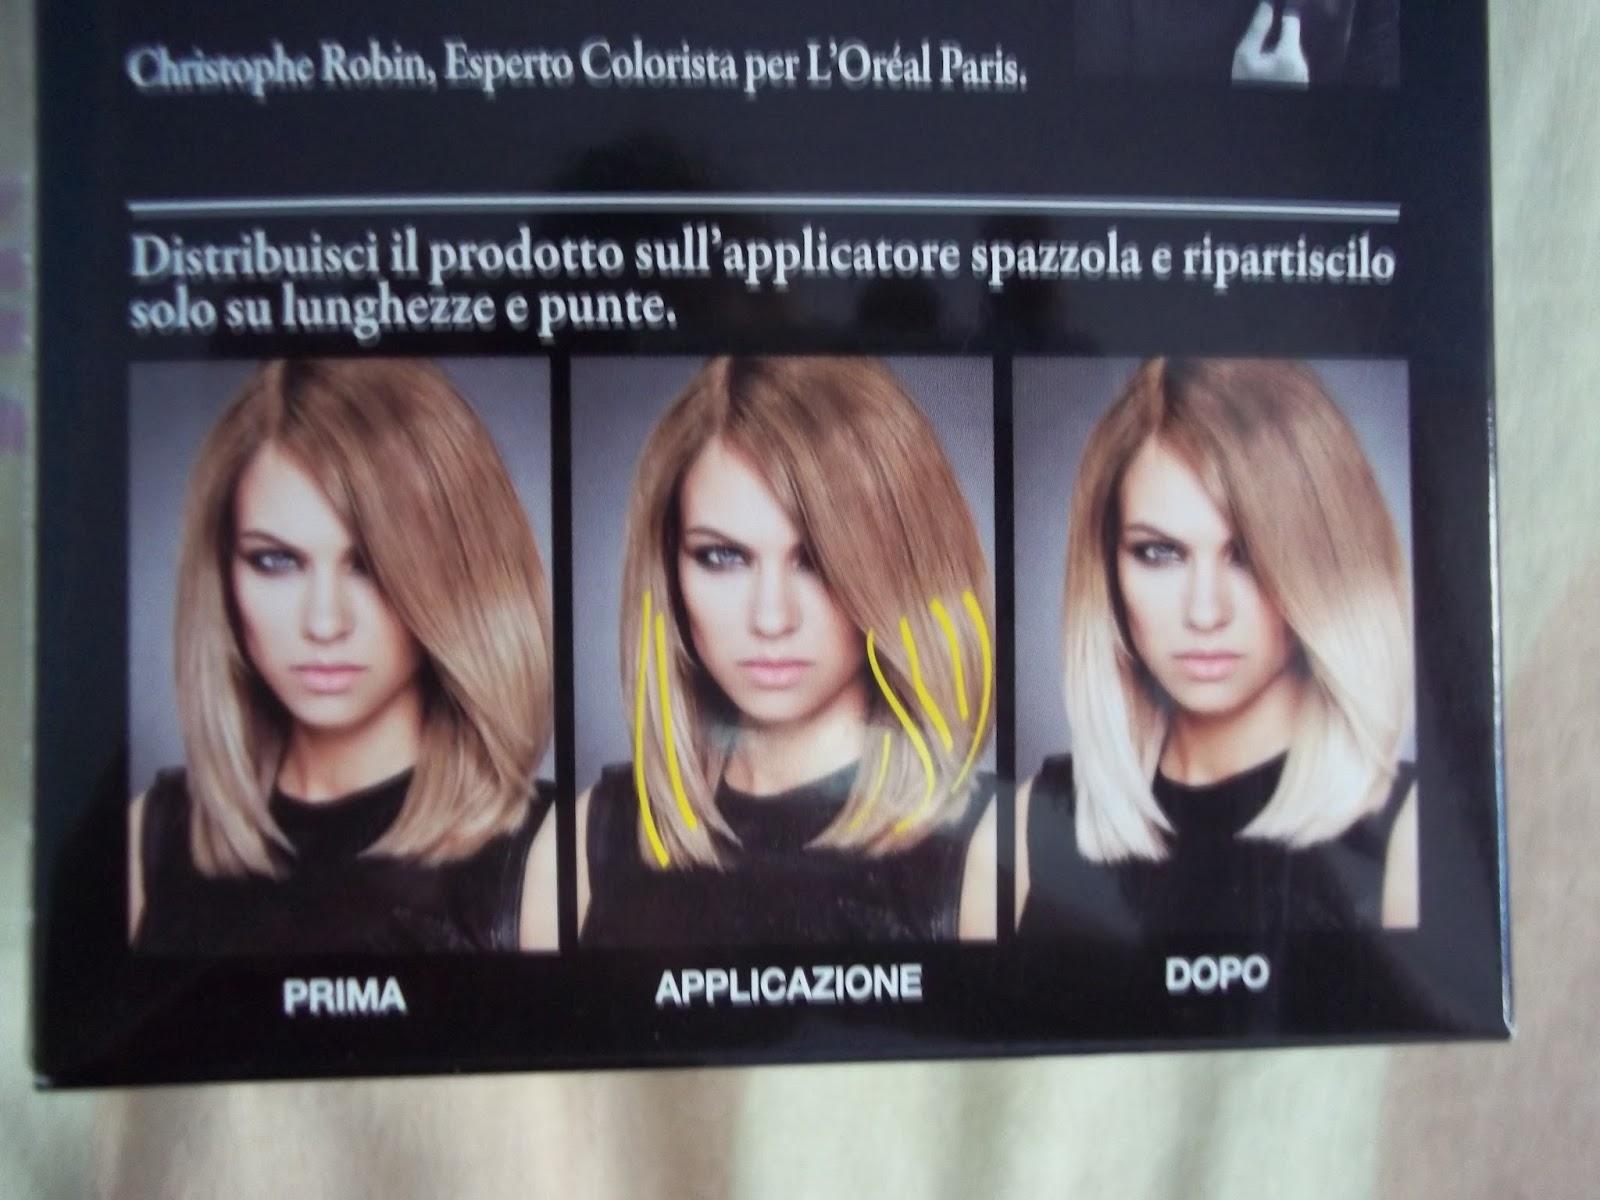 Comprare in deposito in linea di una maschera per capelli